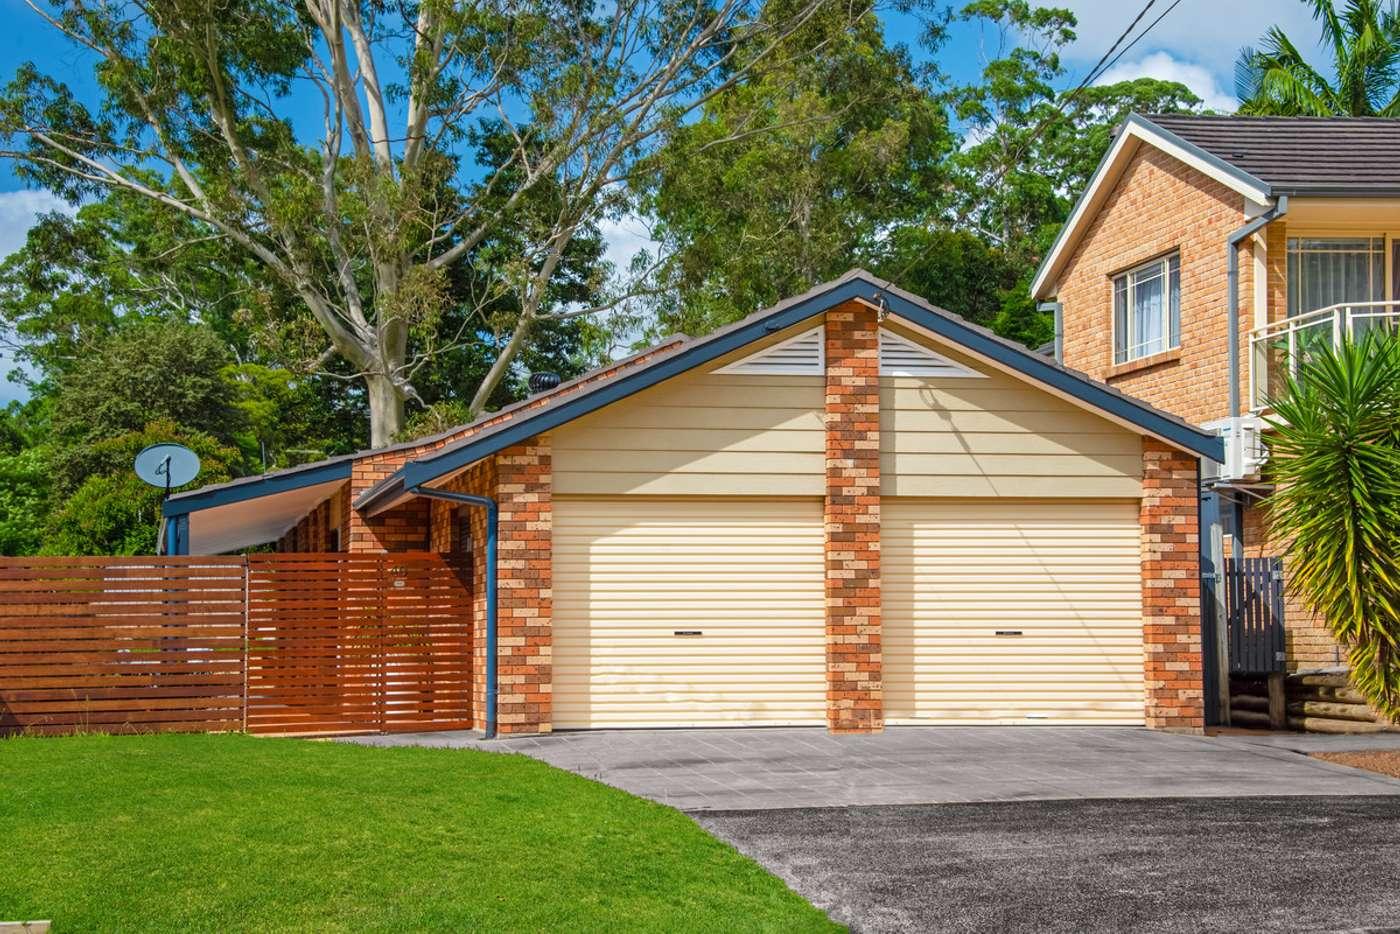 Main view of Homely house listing, 40 Lakala Avenue, Springfield NSW 2250